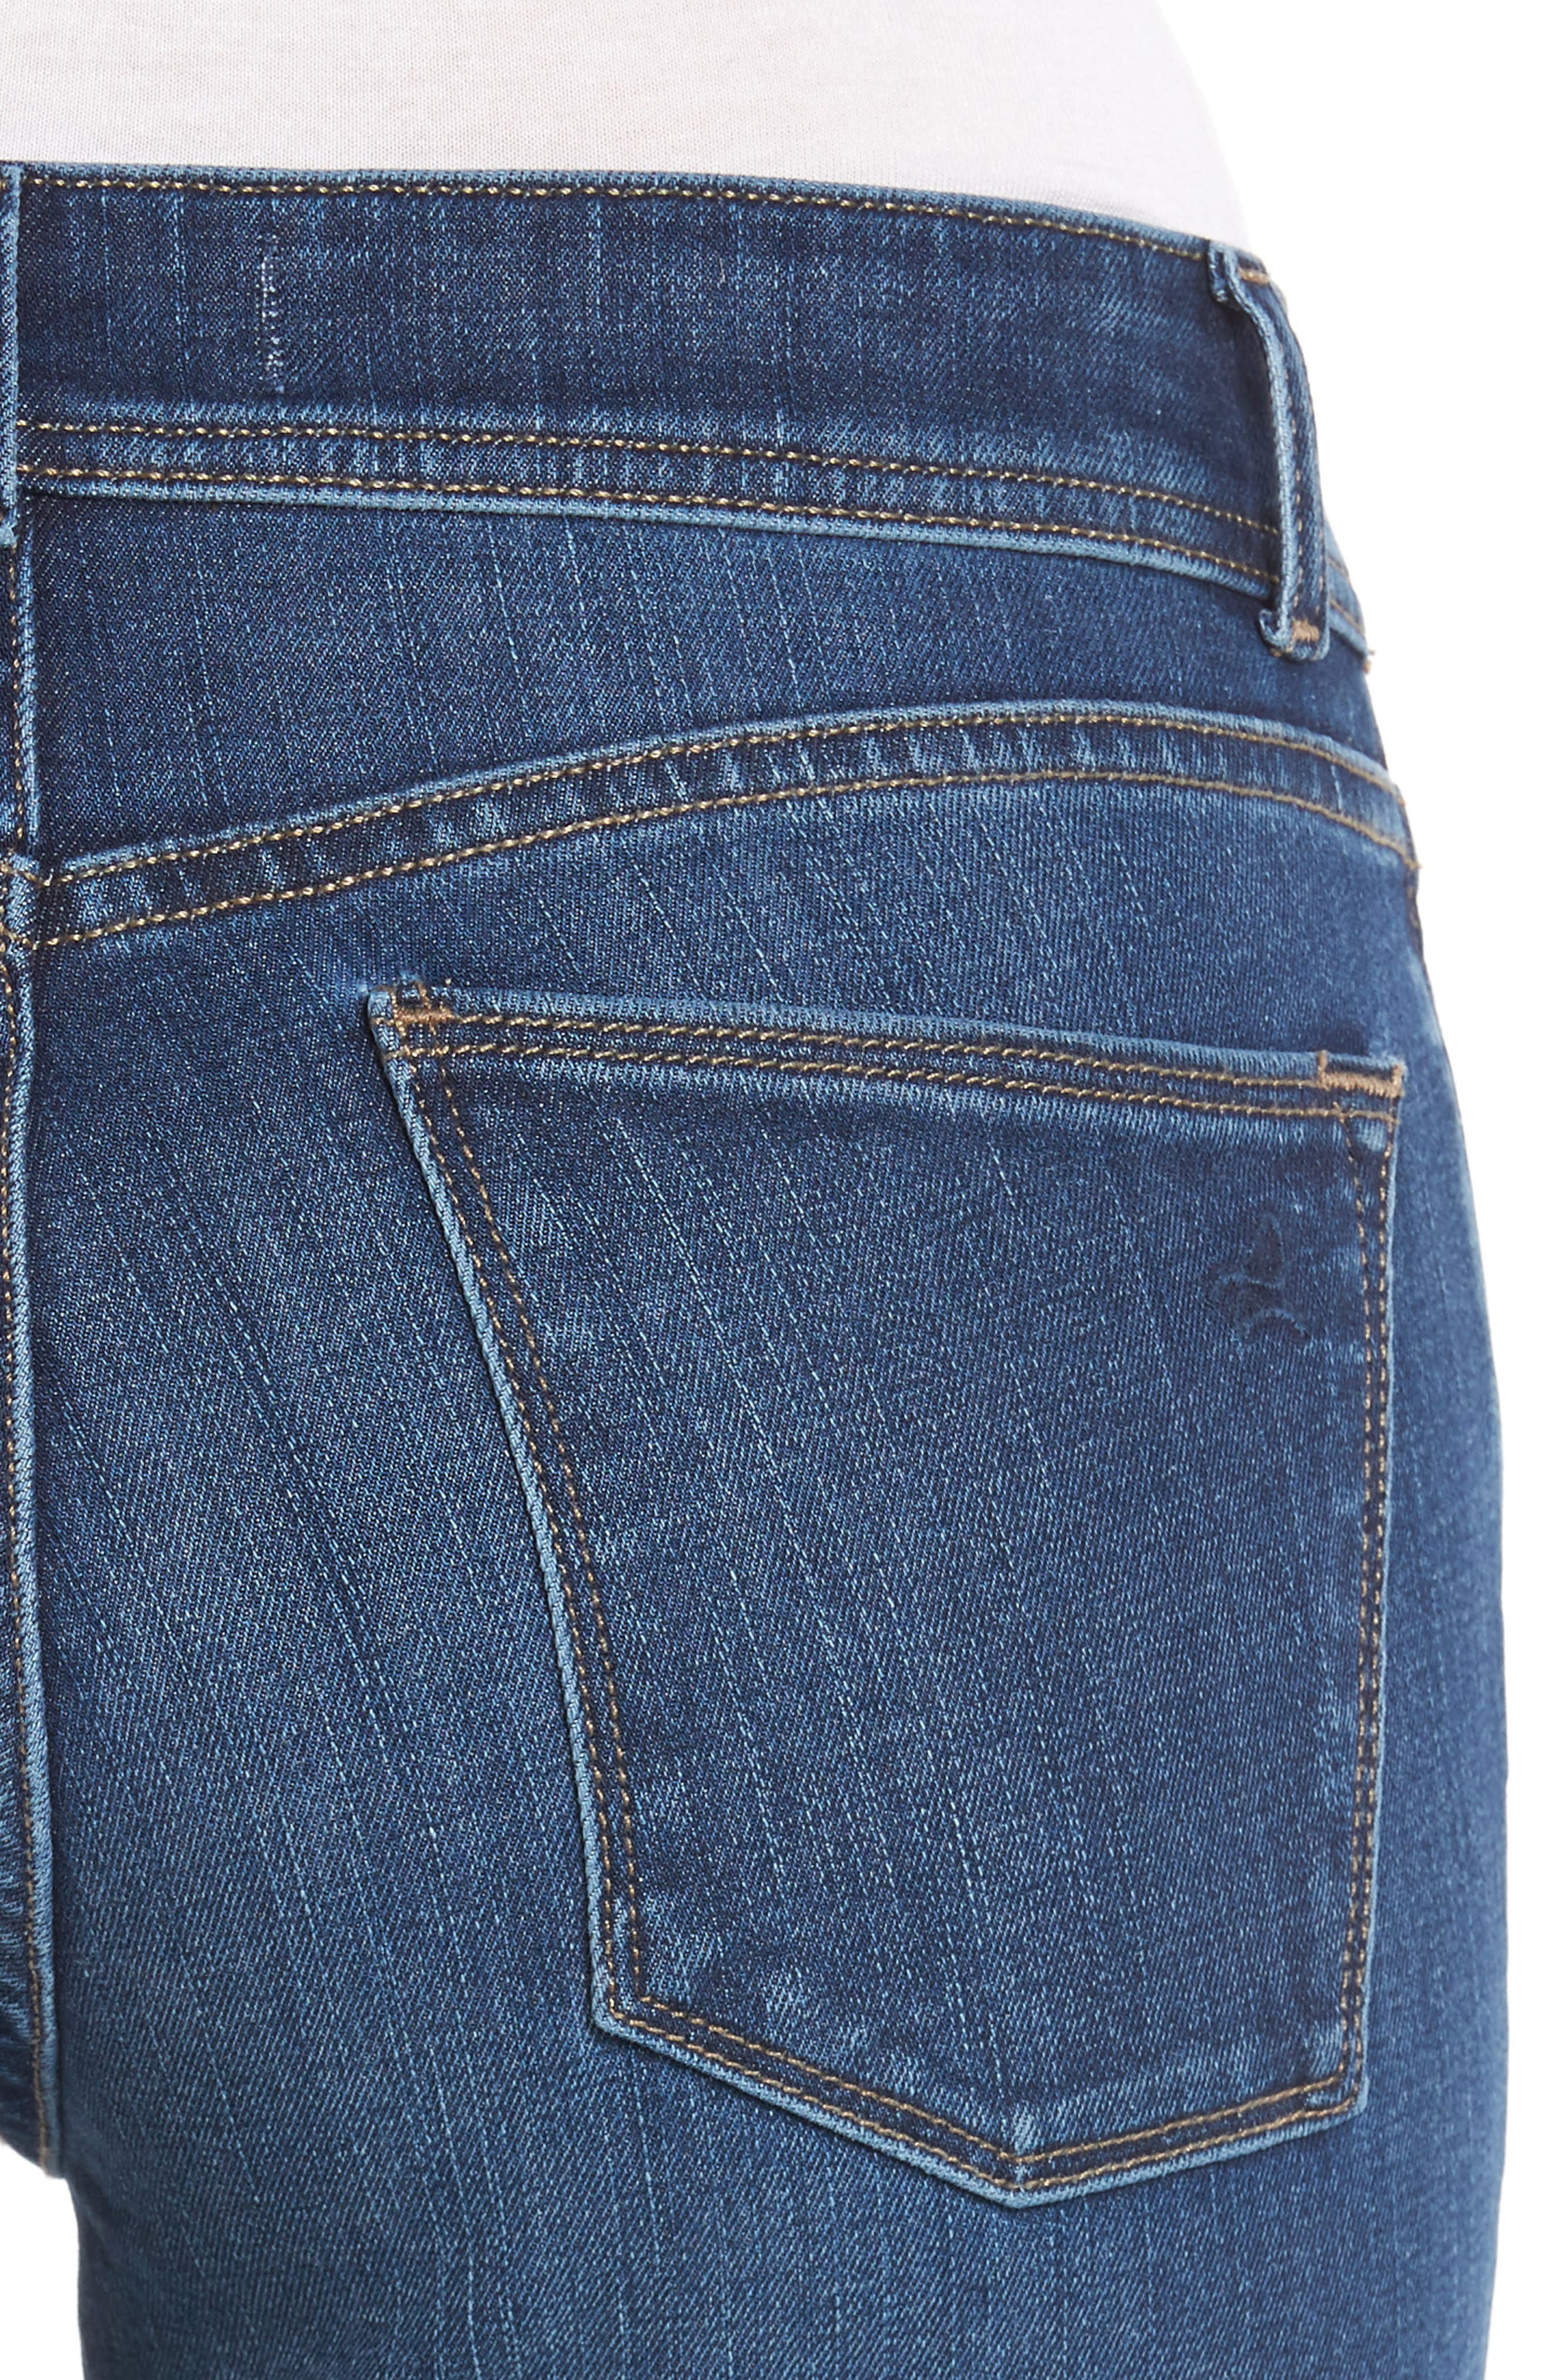 Coco Curvy Straight Leg Jeans,                             Alternate thumbnail 4, color,                             405